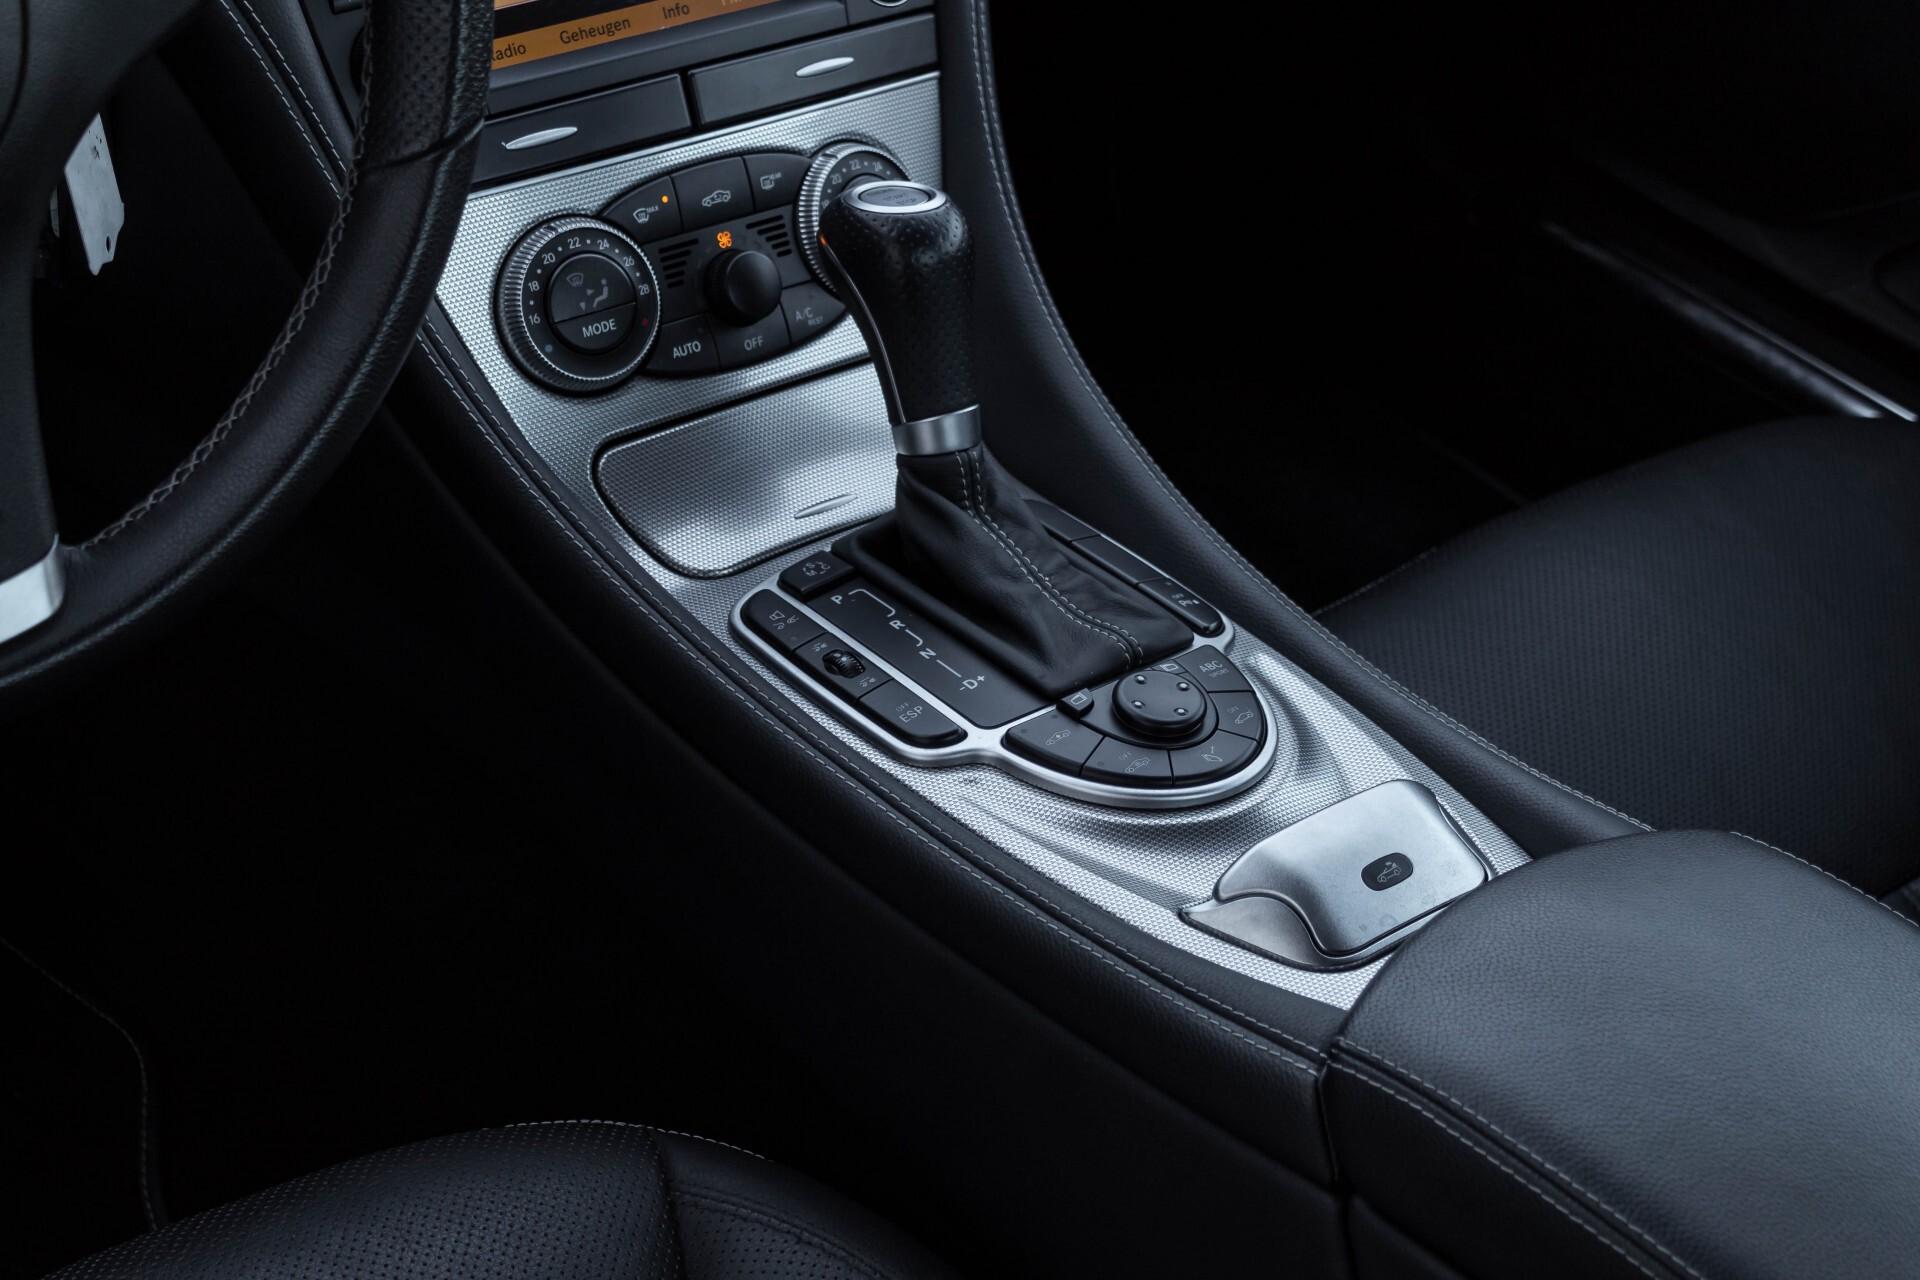 Mercedes-Benz SL-Klasse 500 Sport ABC/Harman-Kardon/Comand/Distronic Aut7 NP €175292 Foto 21